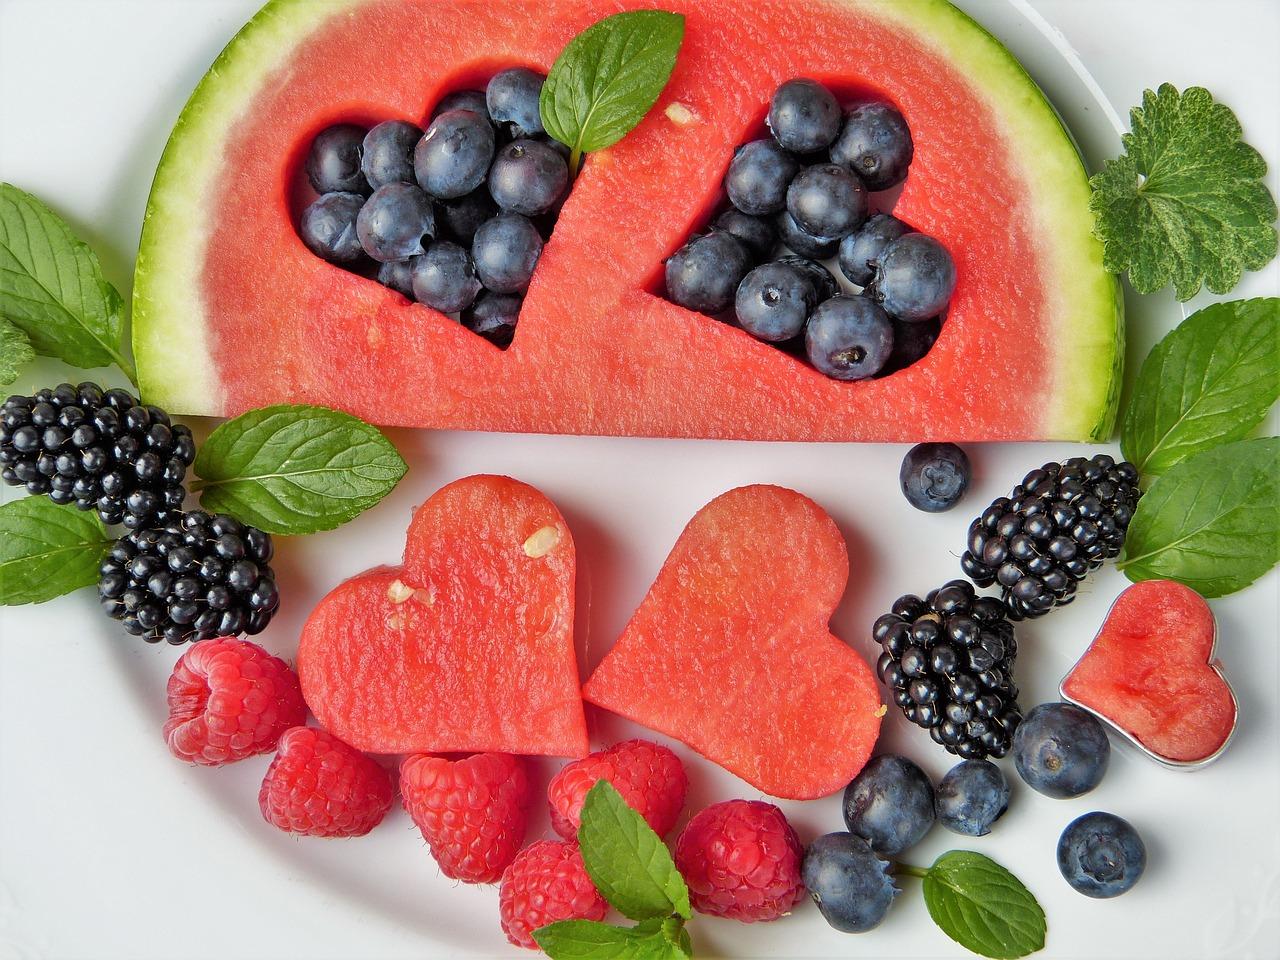 srdce-ovoce-zdravá-strava